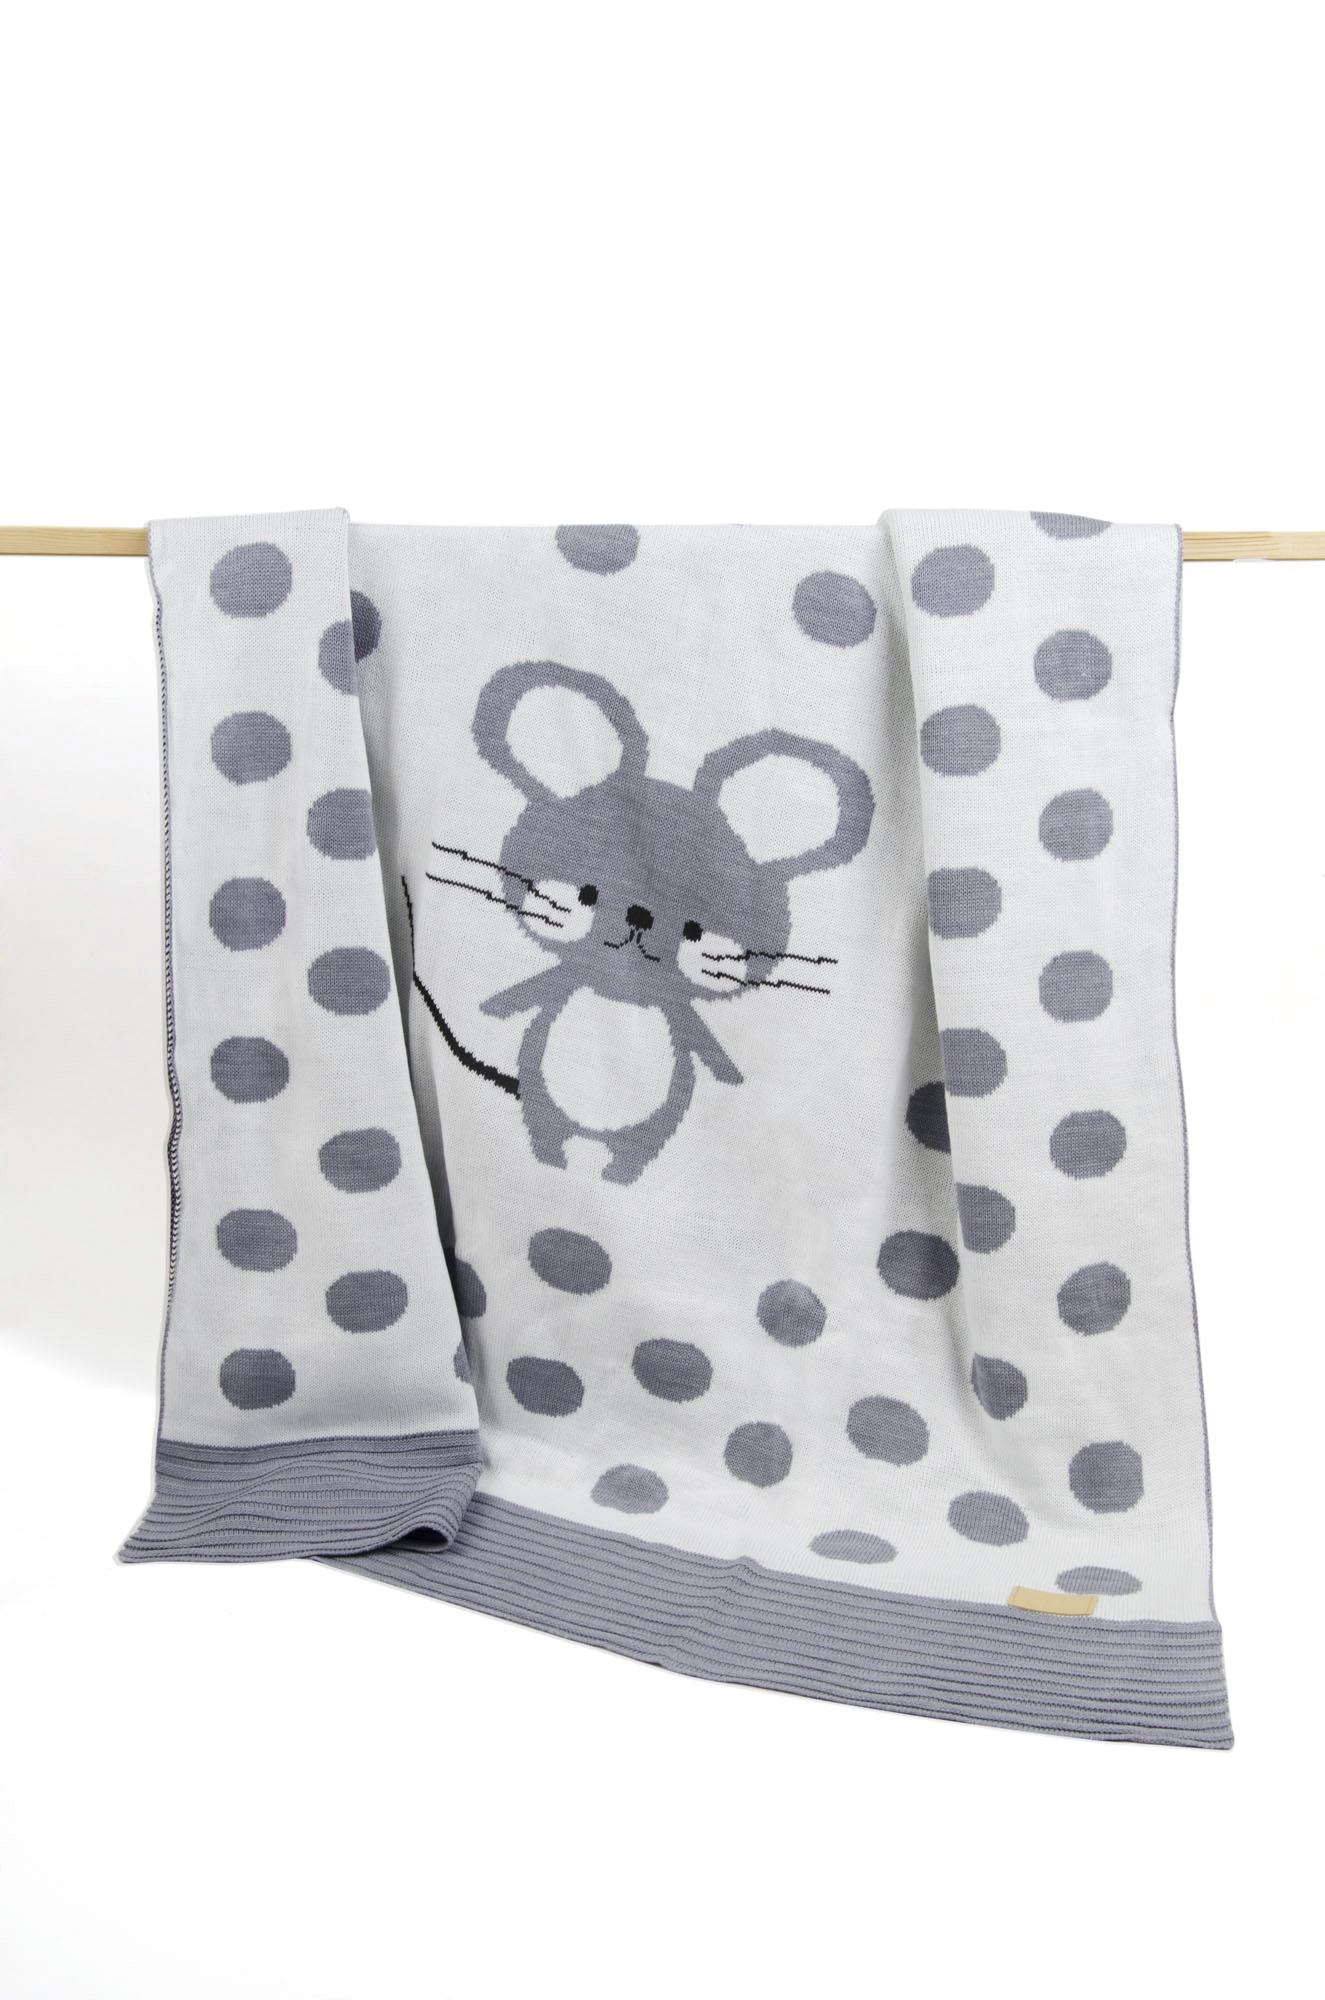 пледы Плед детский Ma Licorne Petite mickey gris (серый), 1х1 м